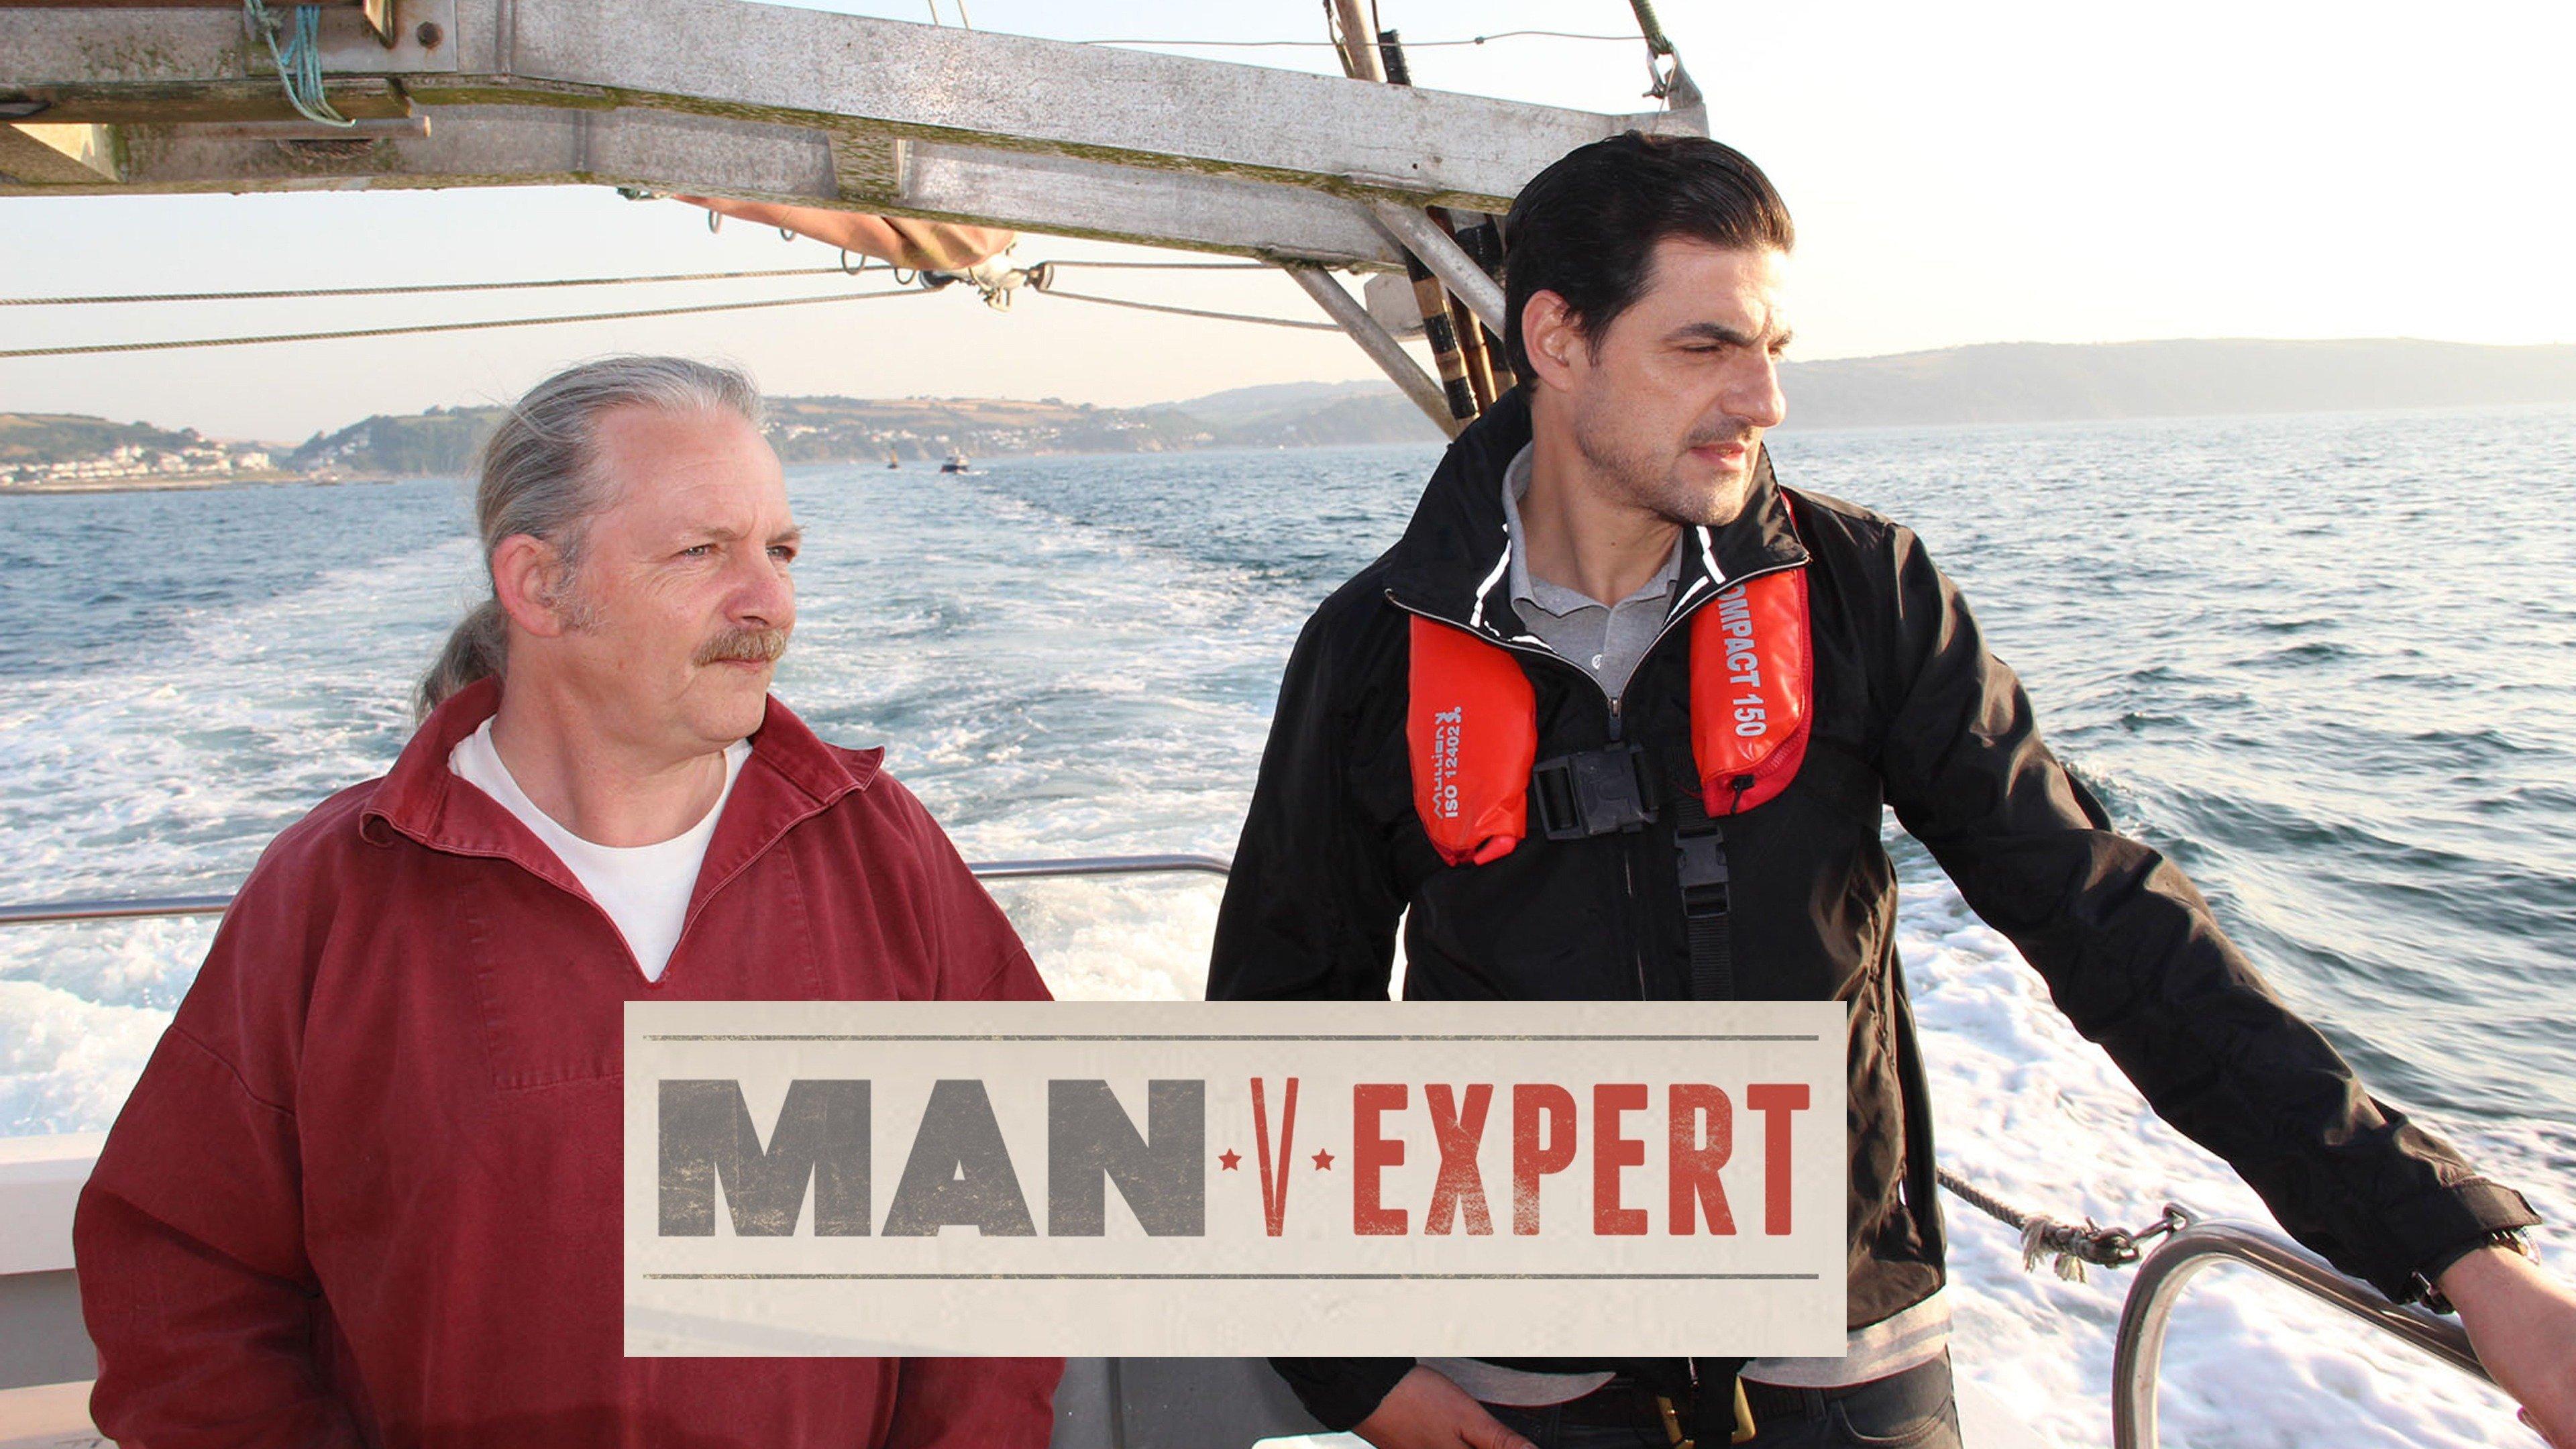 Man vs Expert